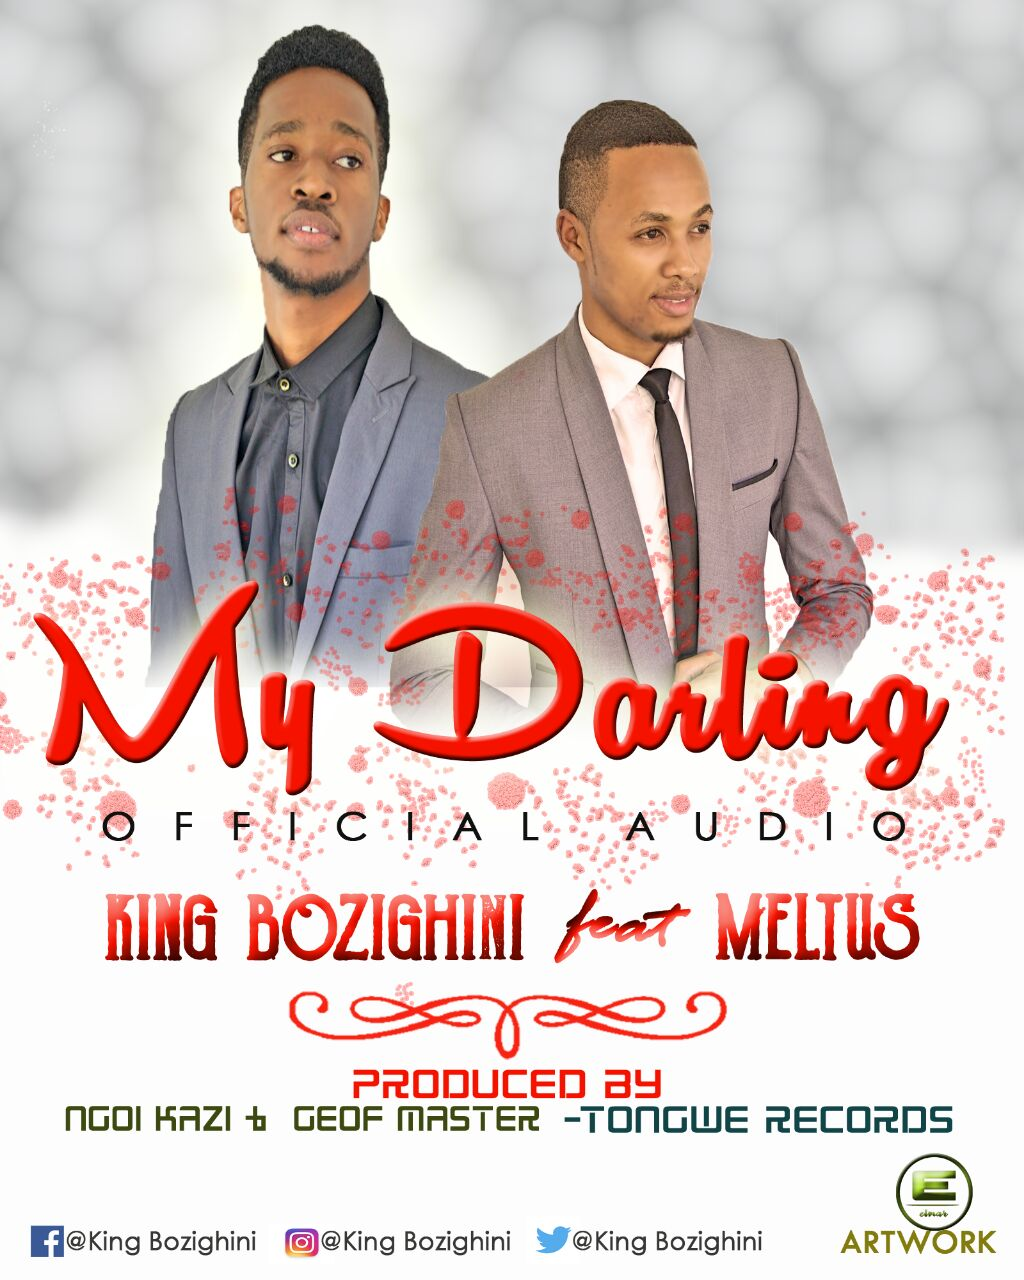 New AUDIO:King Bozighini(DoctorRapper) Ft Meltus - My